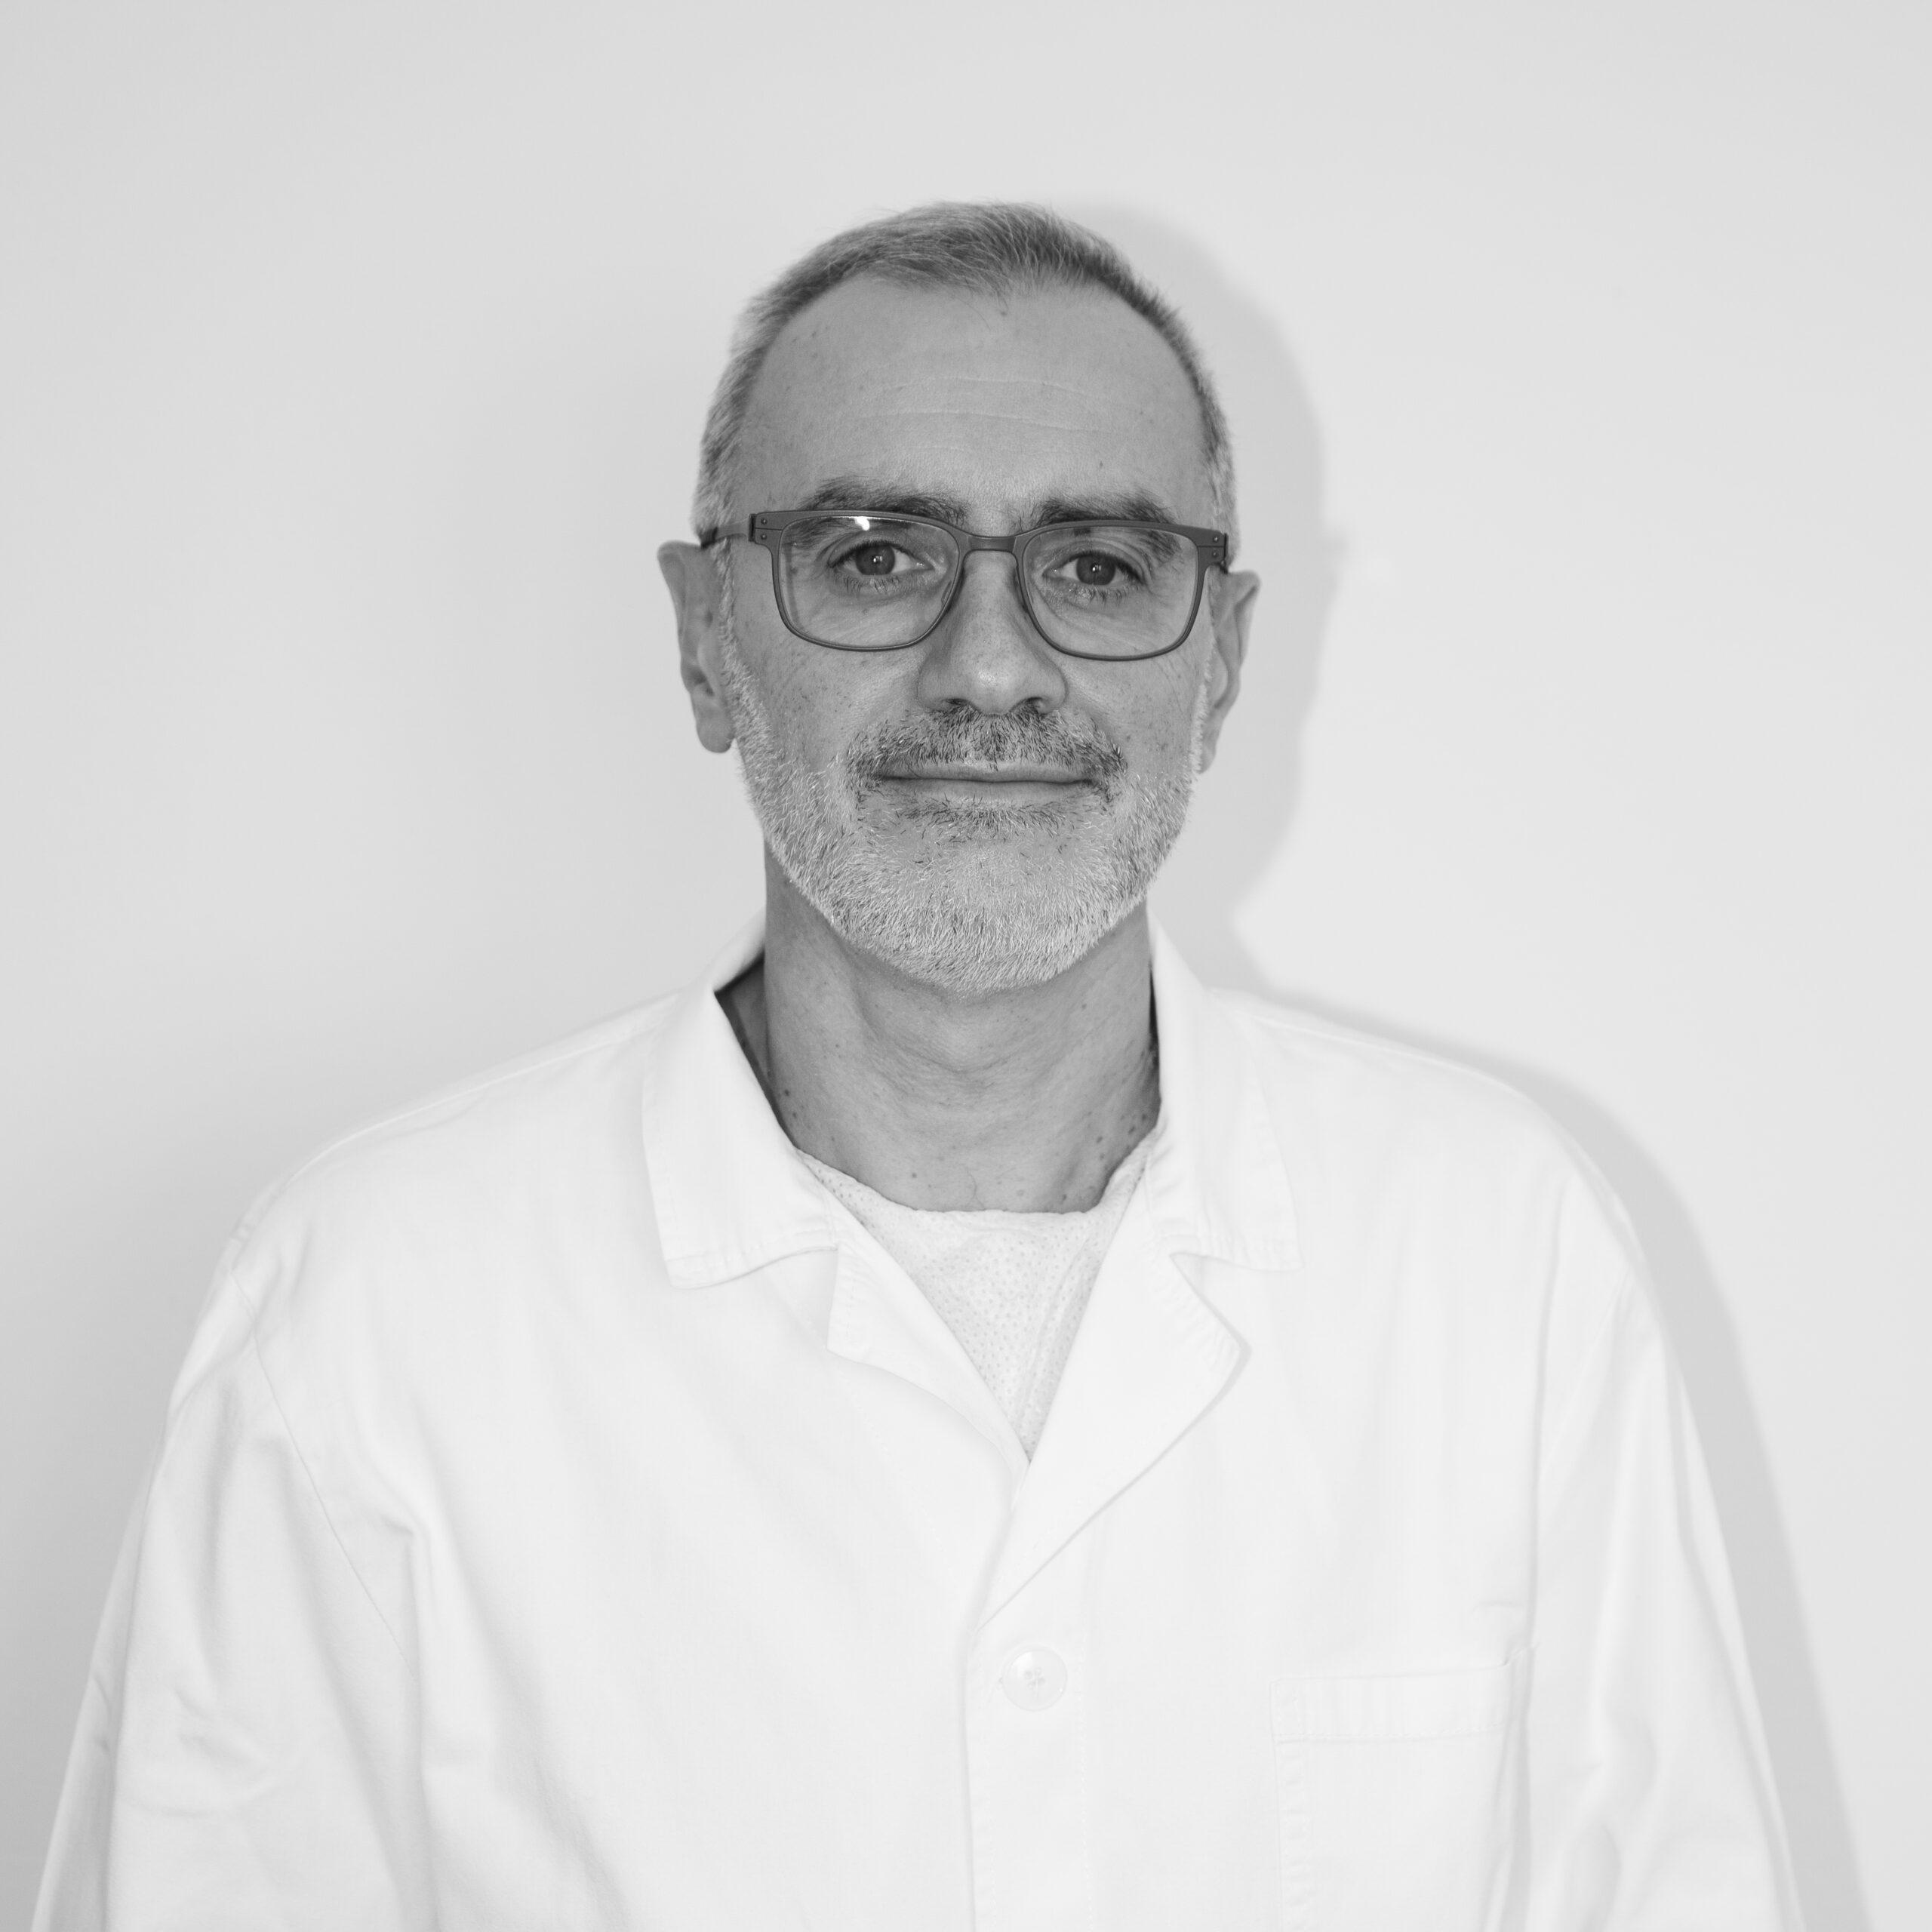 Dr. P. Zencher